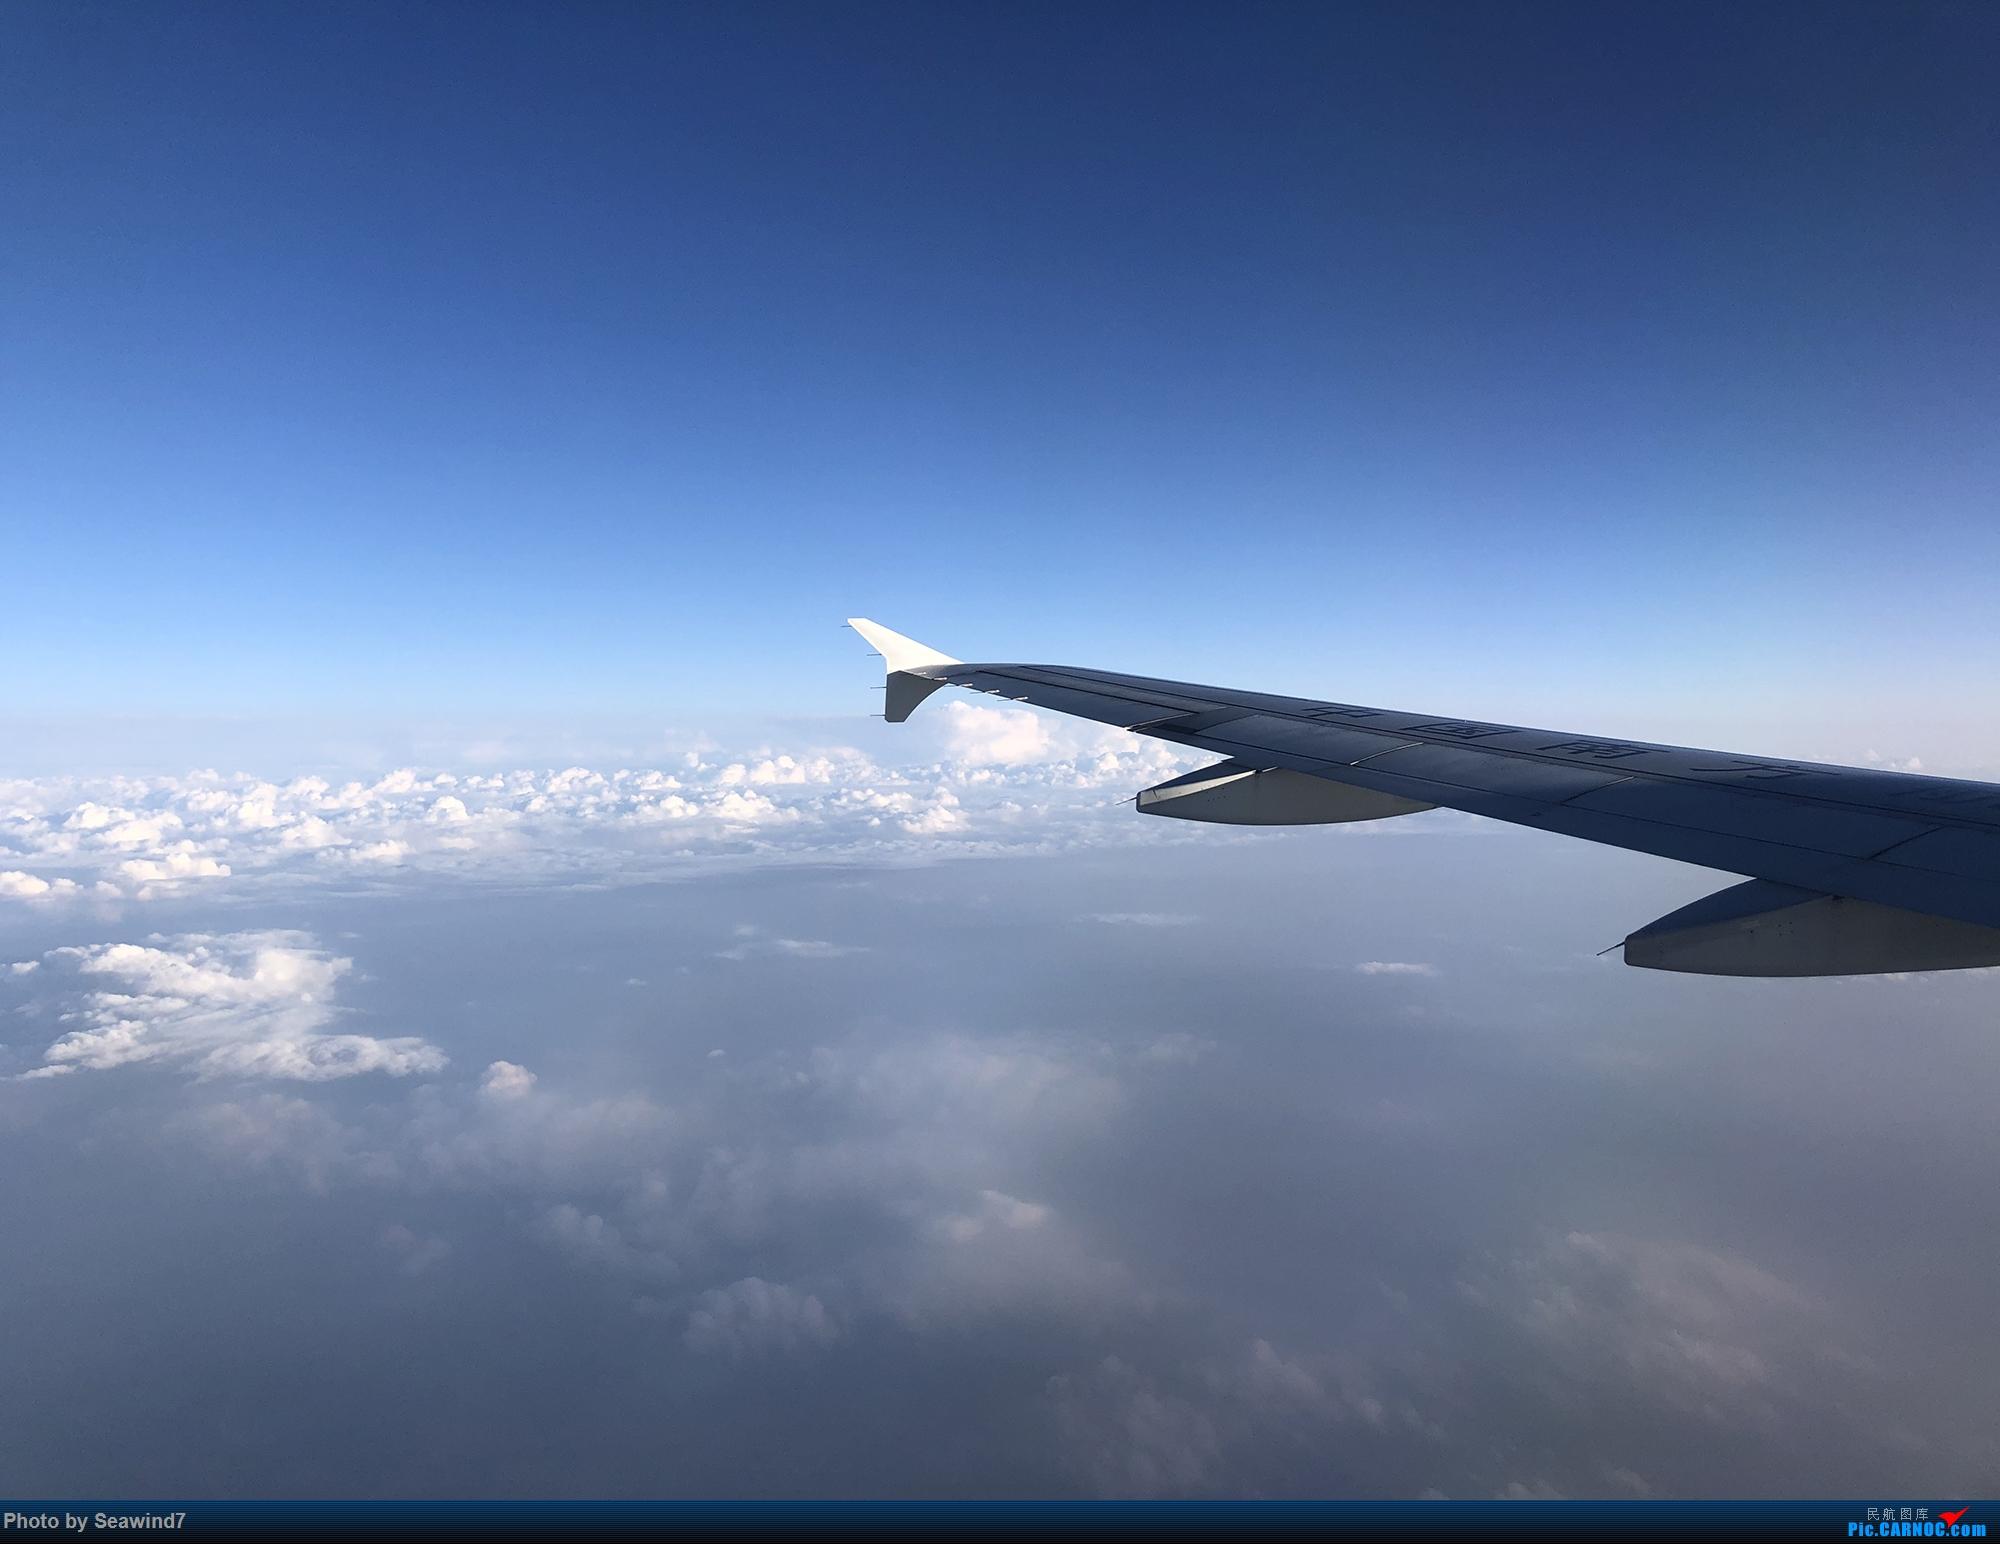 Re:[Seawind7游记第九弹]长春往返,南航明珠经济舱体验